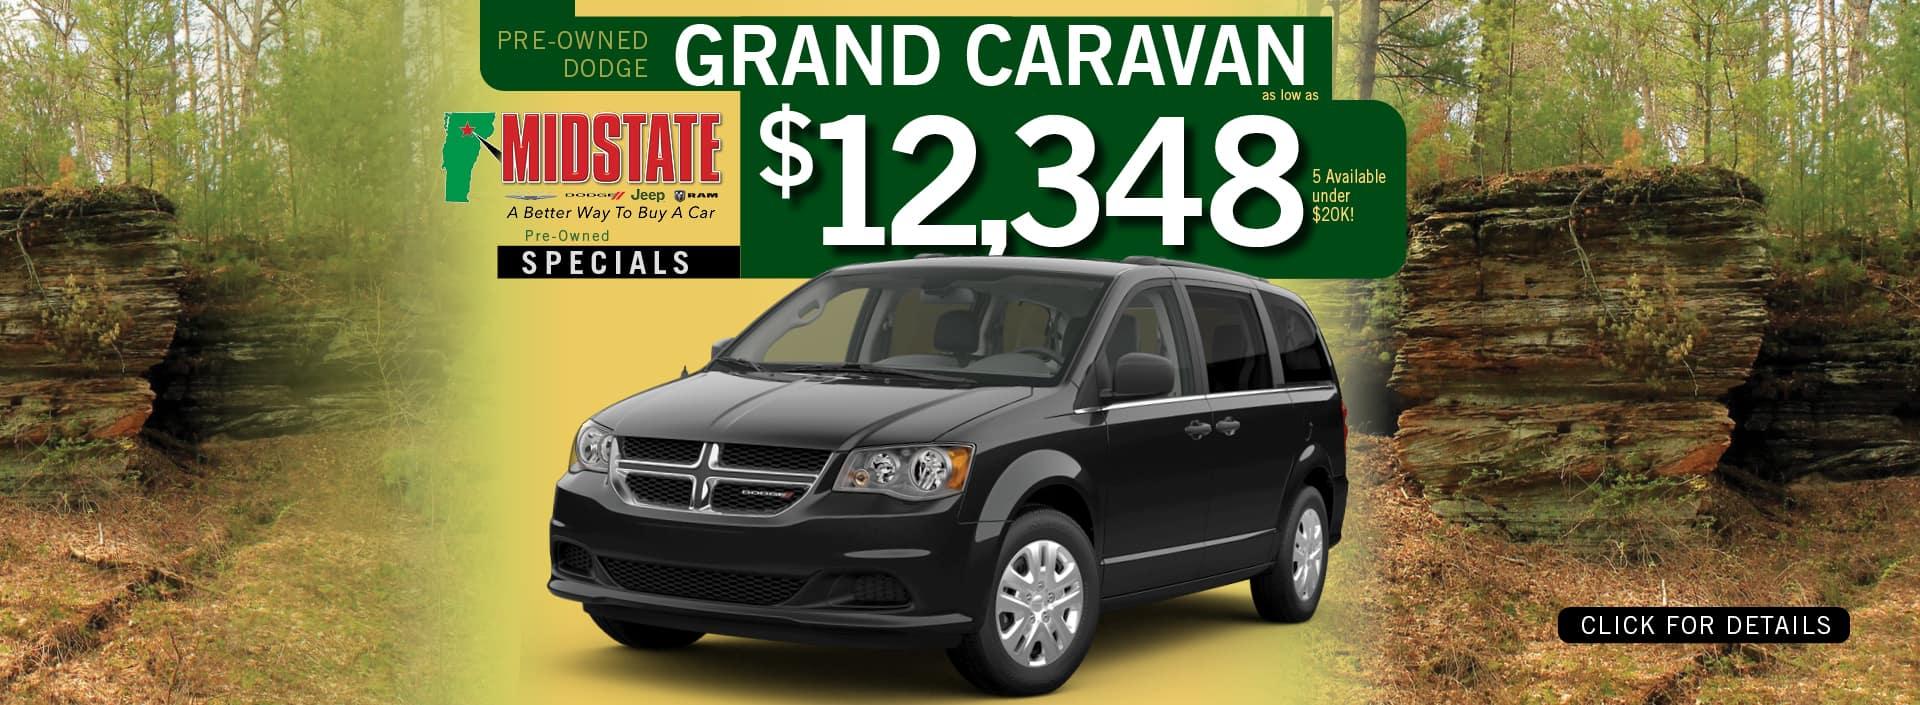 Used Dodge Grand Caravan